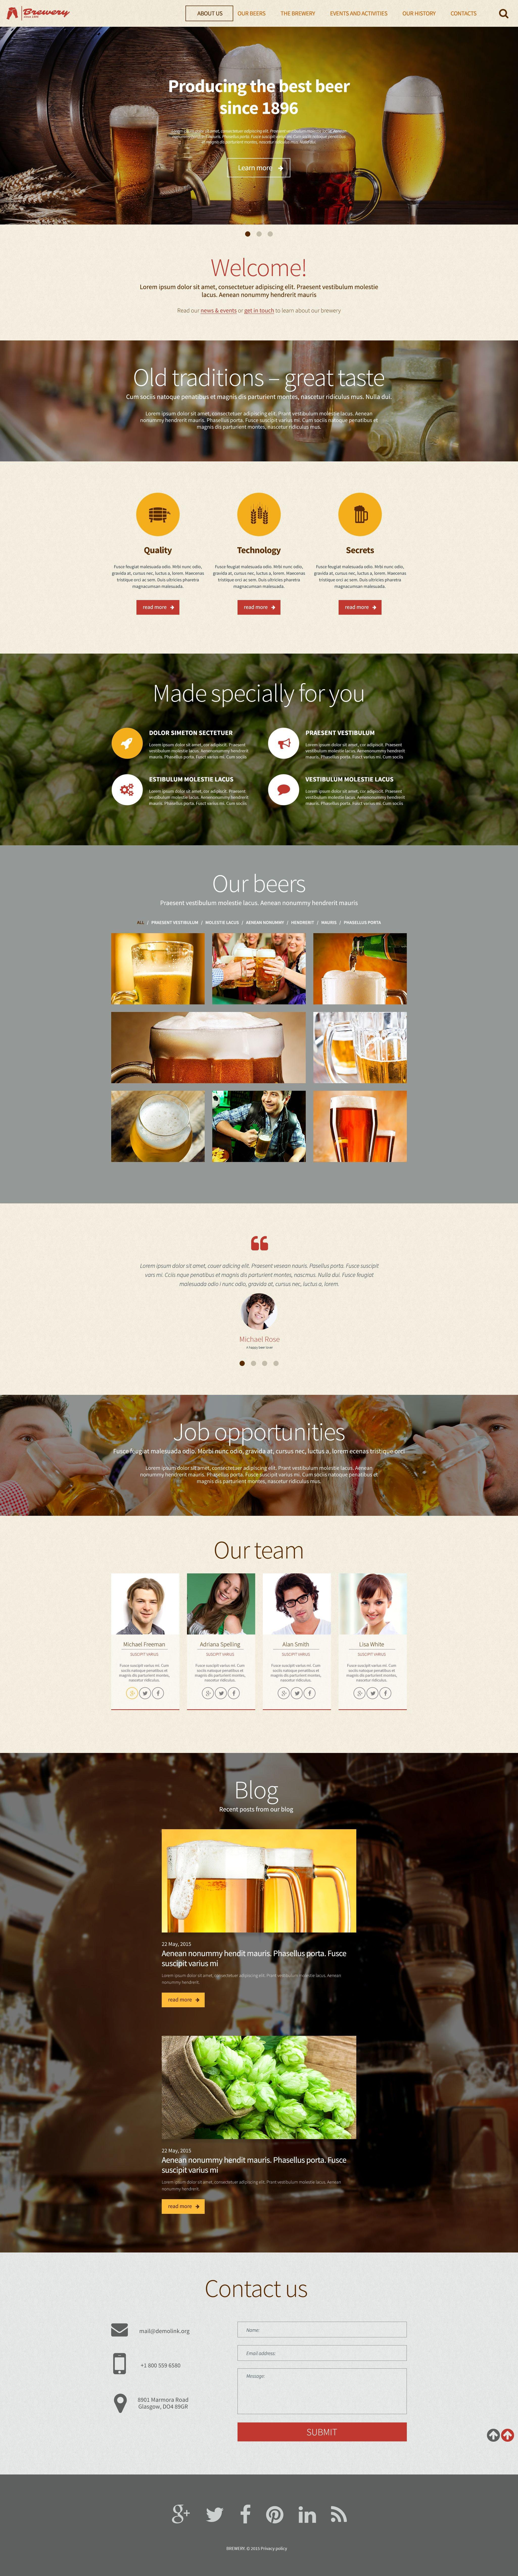 Responsivt Brewery WordPress-tema #55486